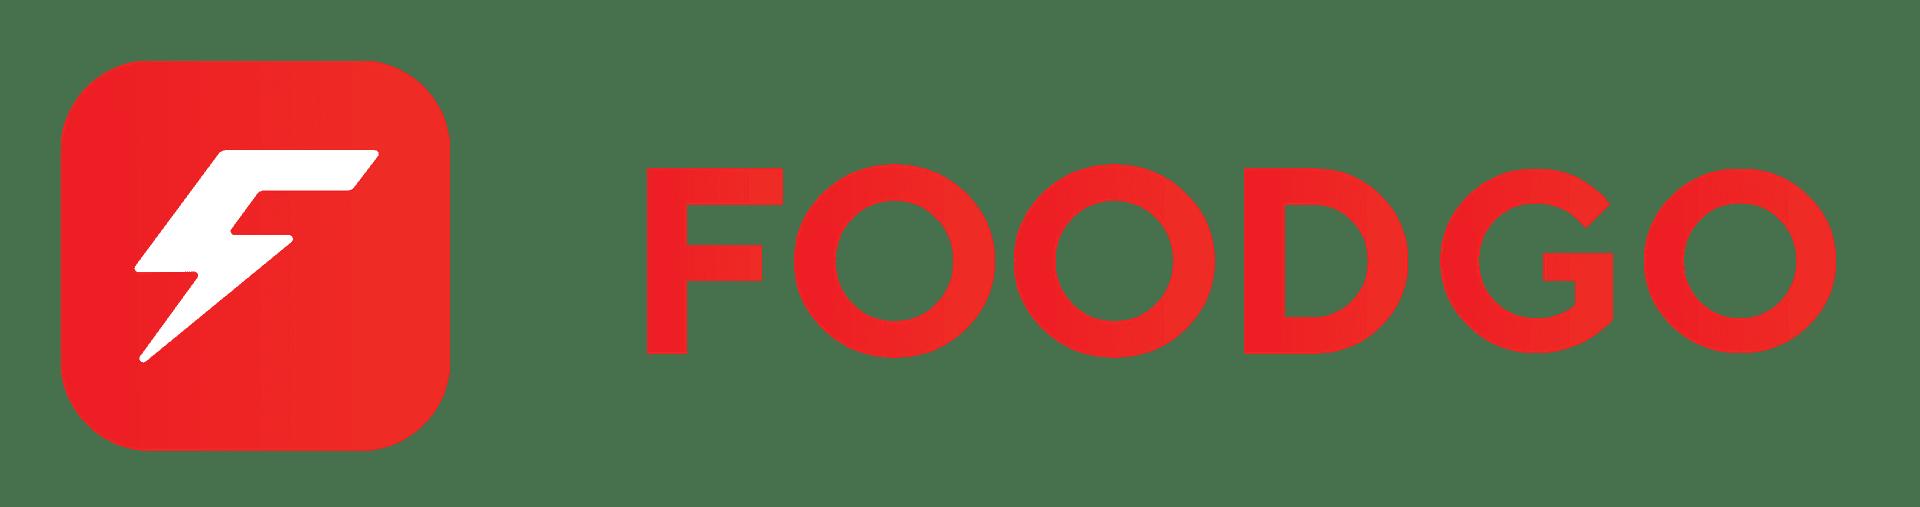 FoodGo.mx logo